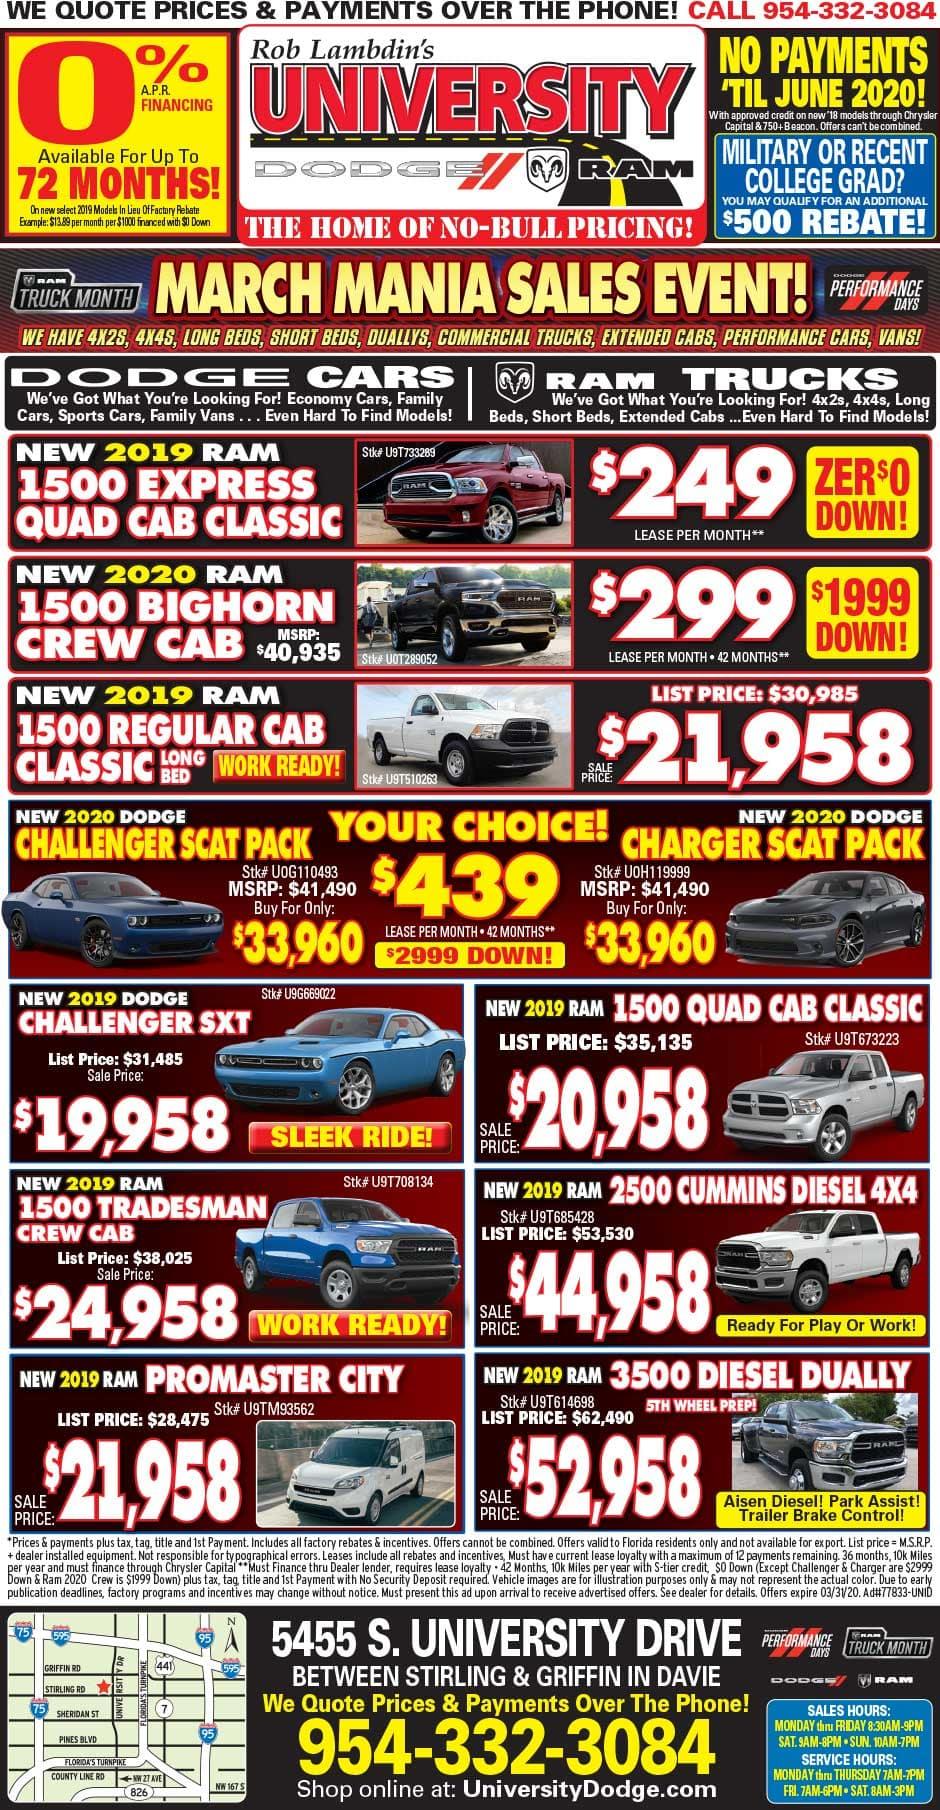 Newspaper Specials - University Dodge RAM